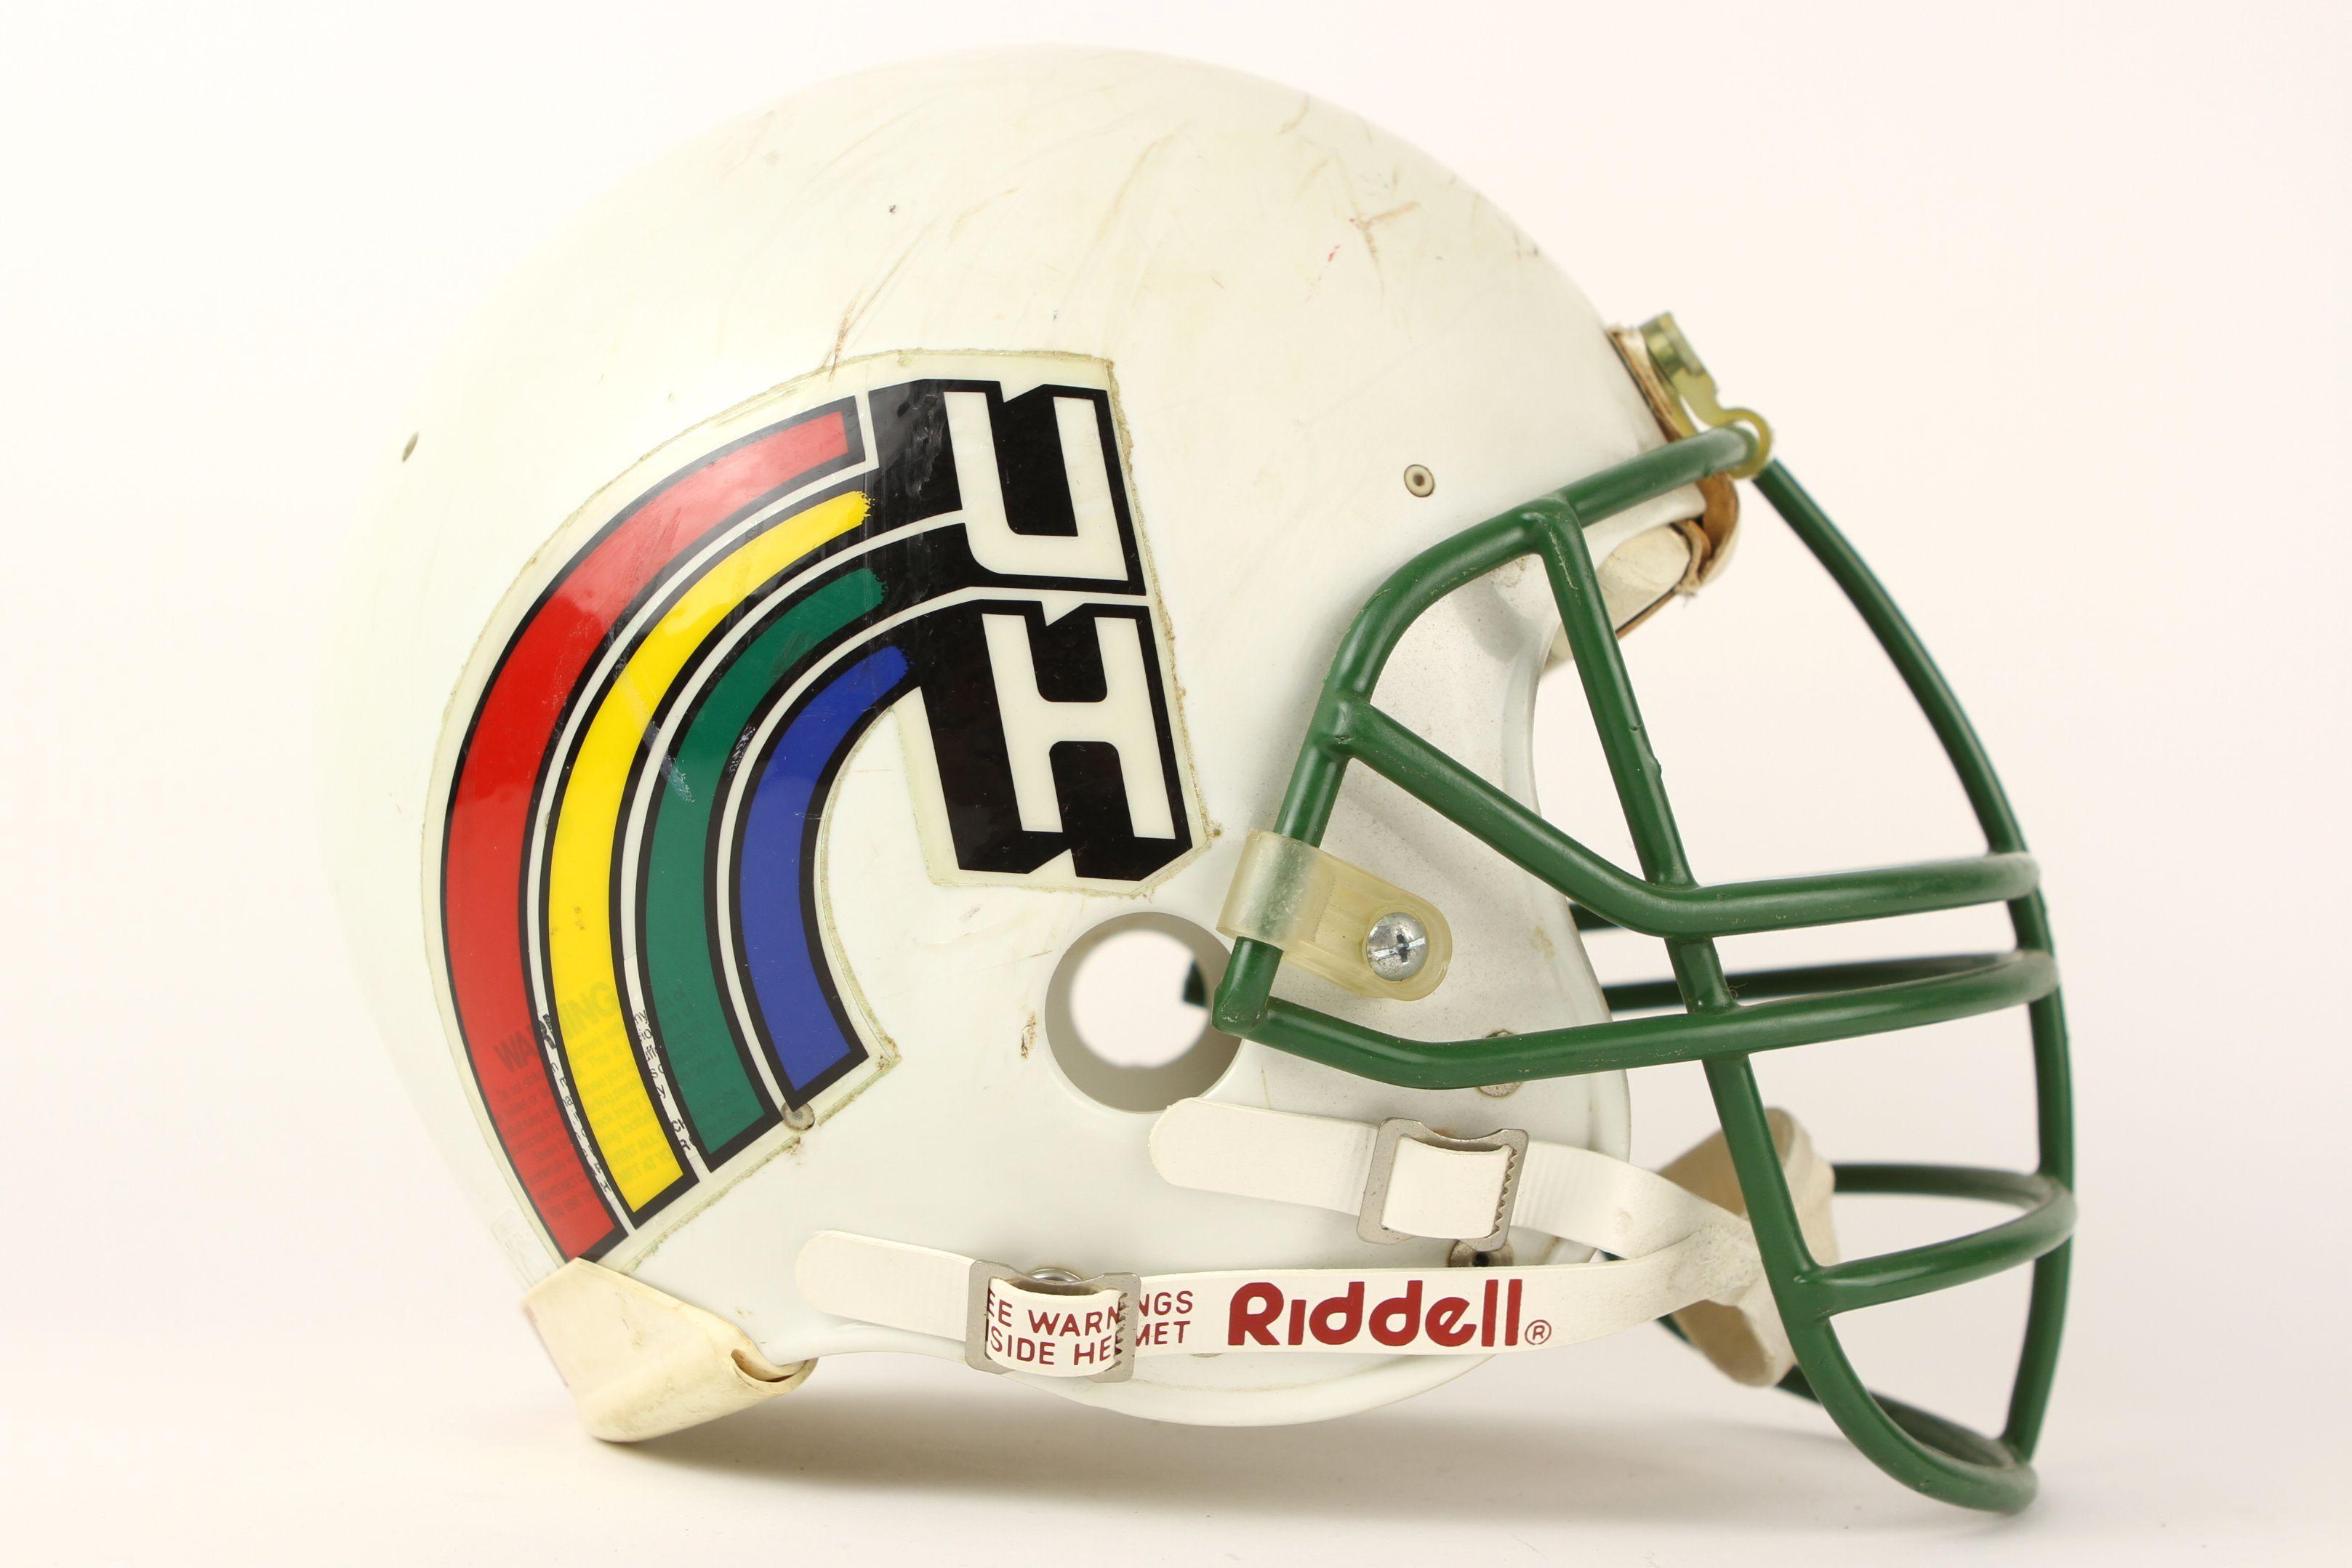 Hawaii Rainbow Warriors Football Helmets Football College Football Helmets